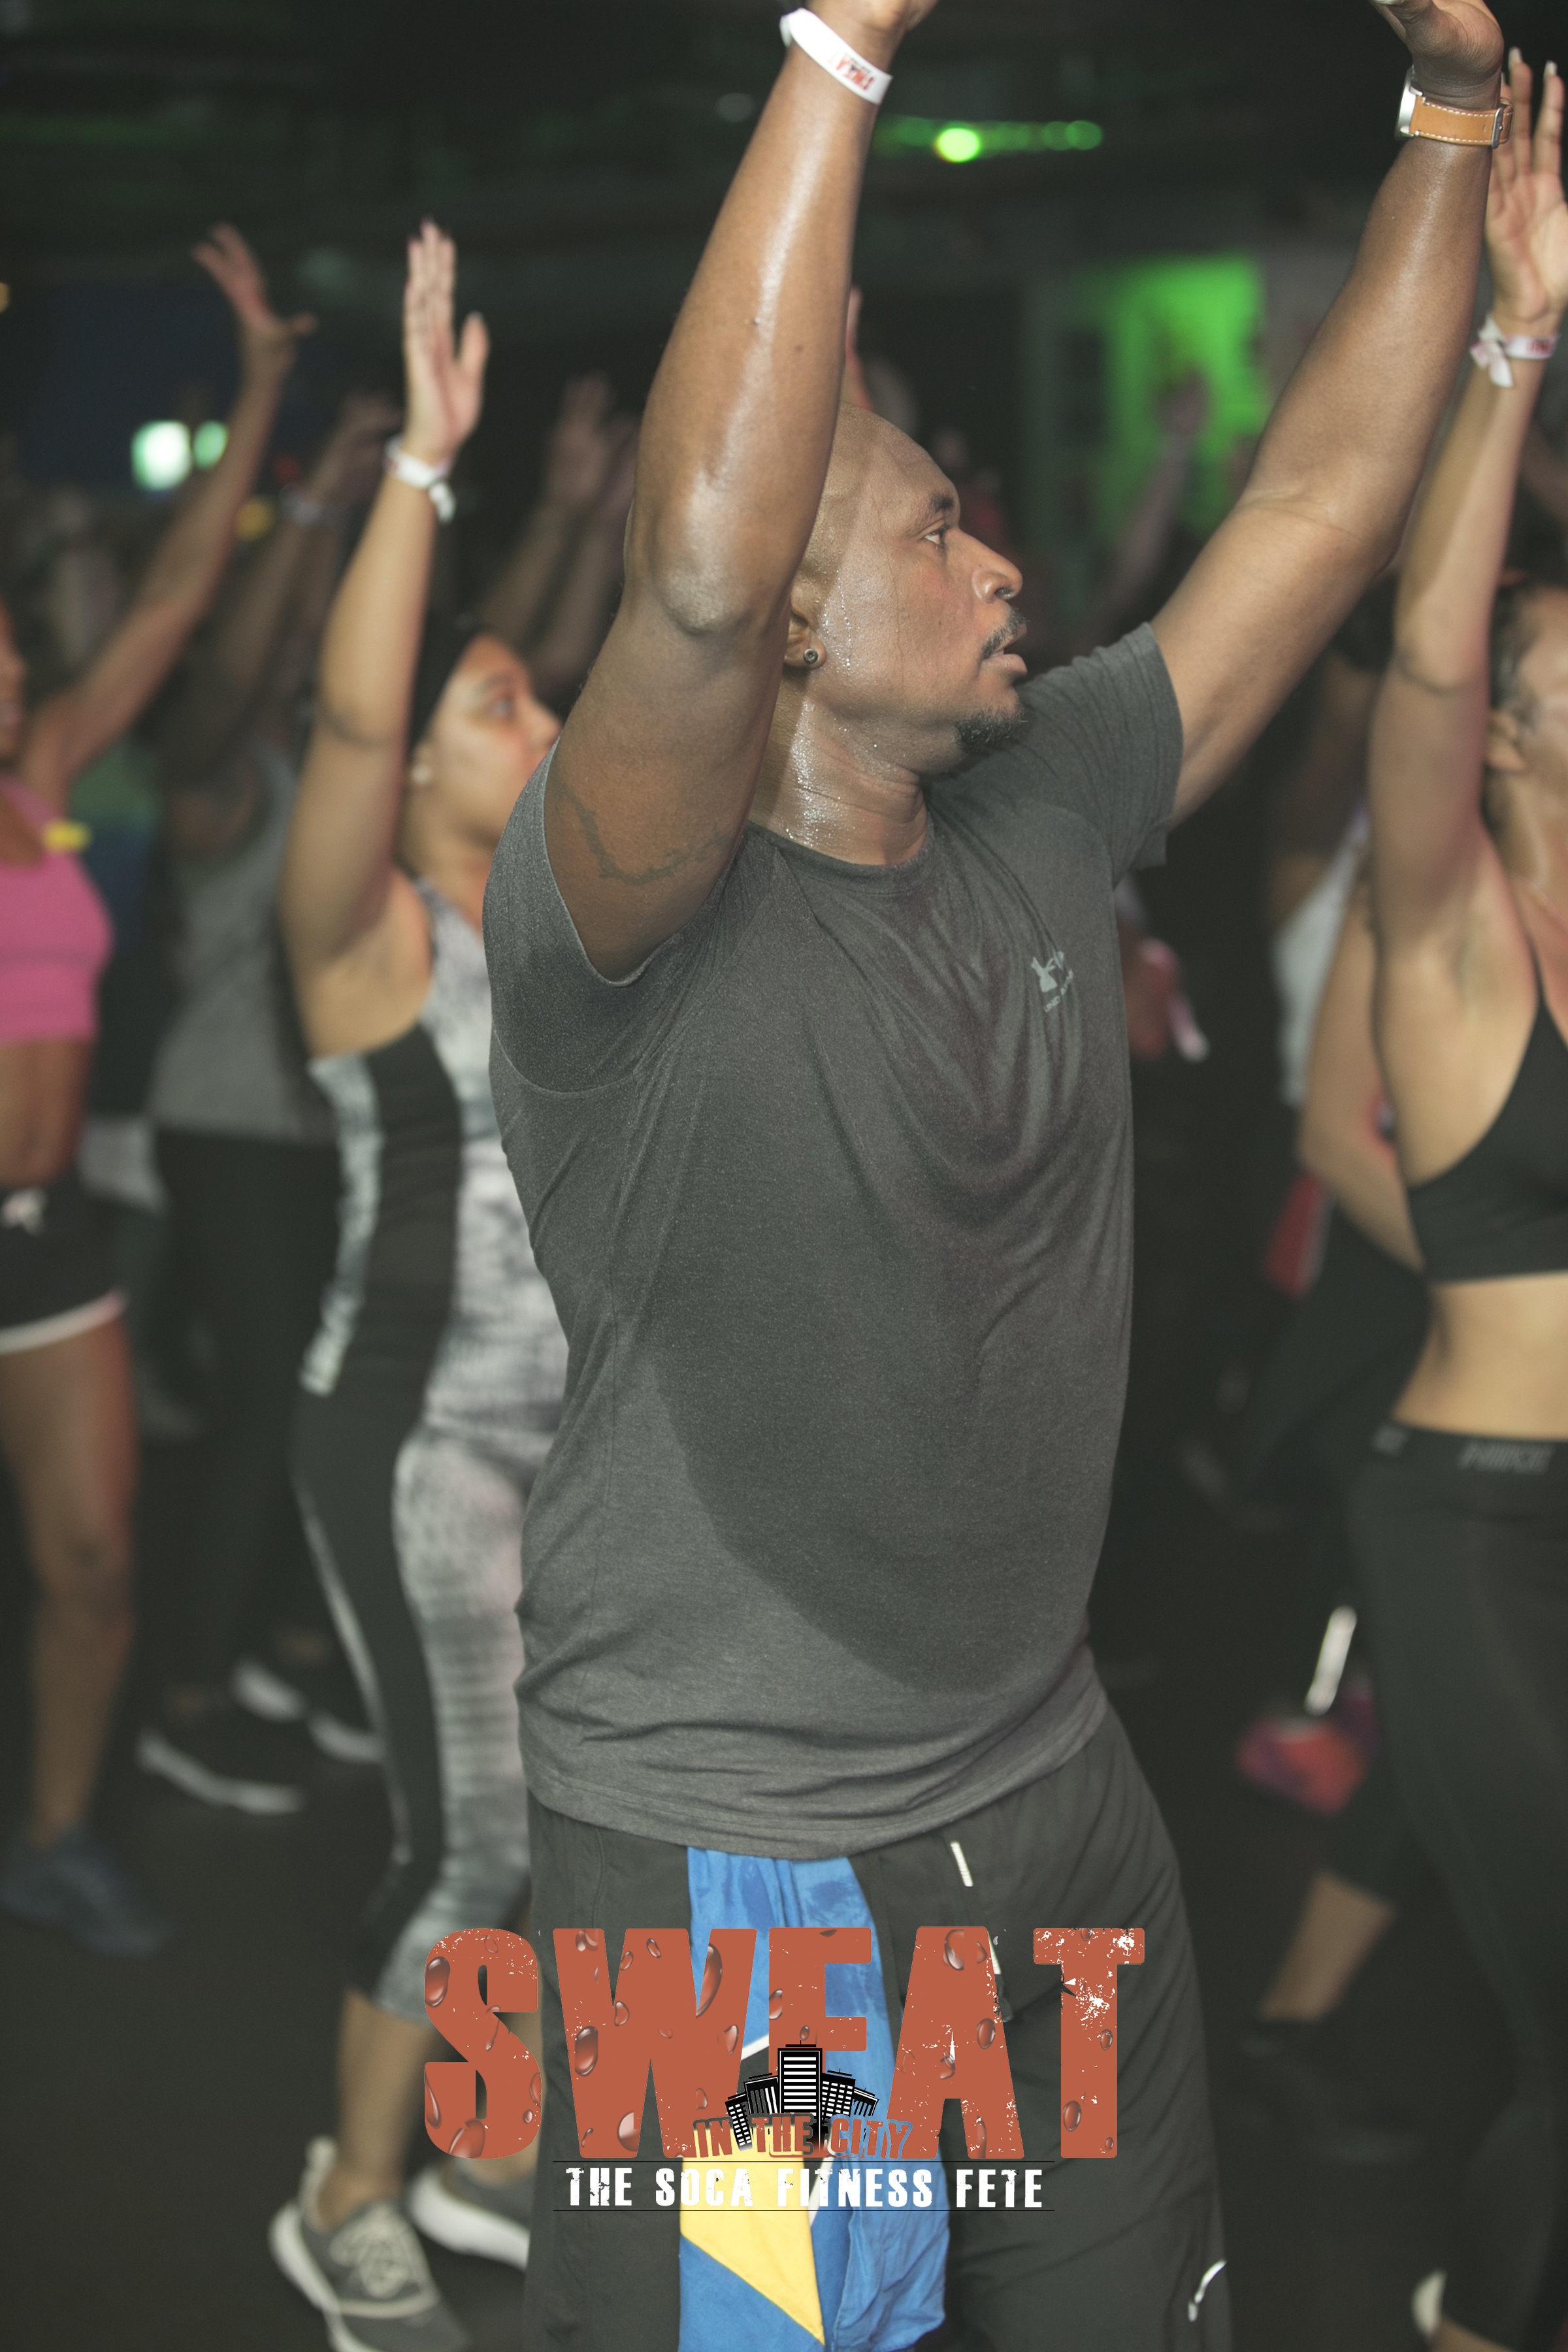 The Soca Fitness Fete V